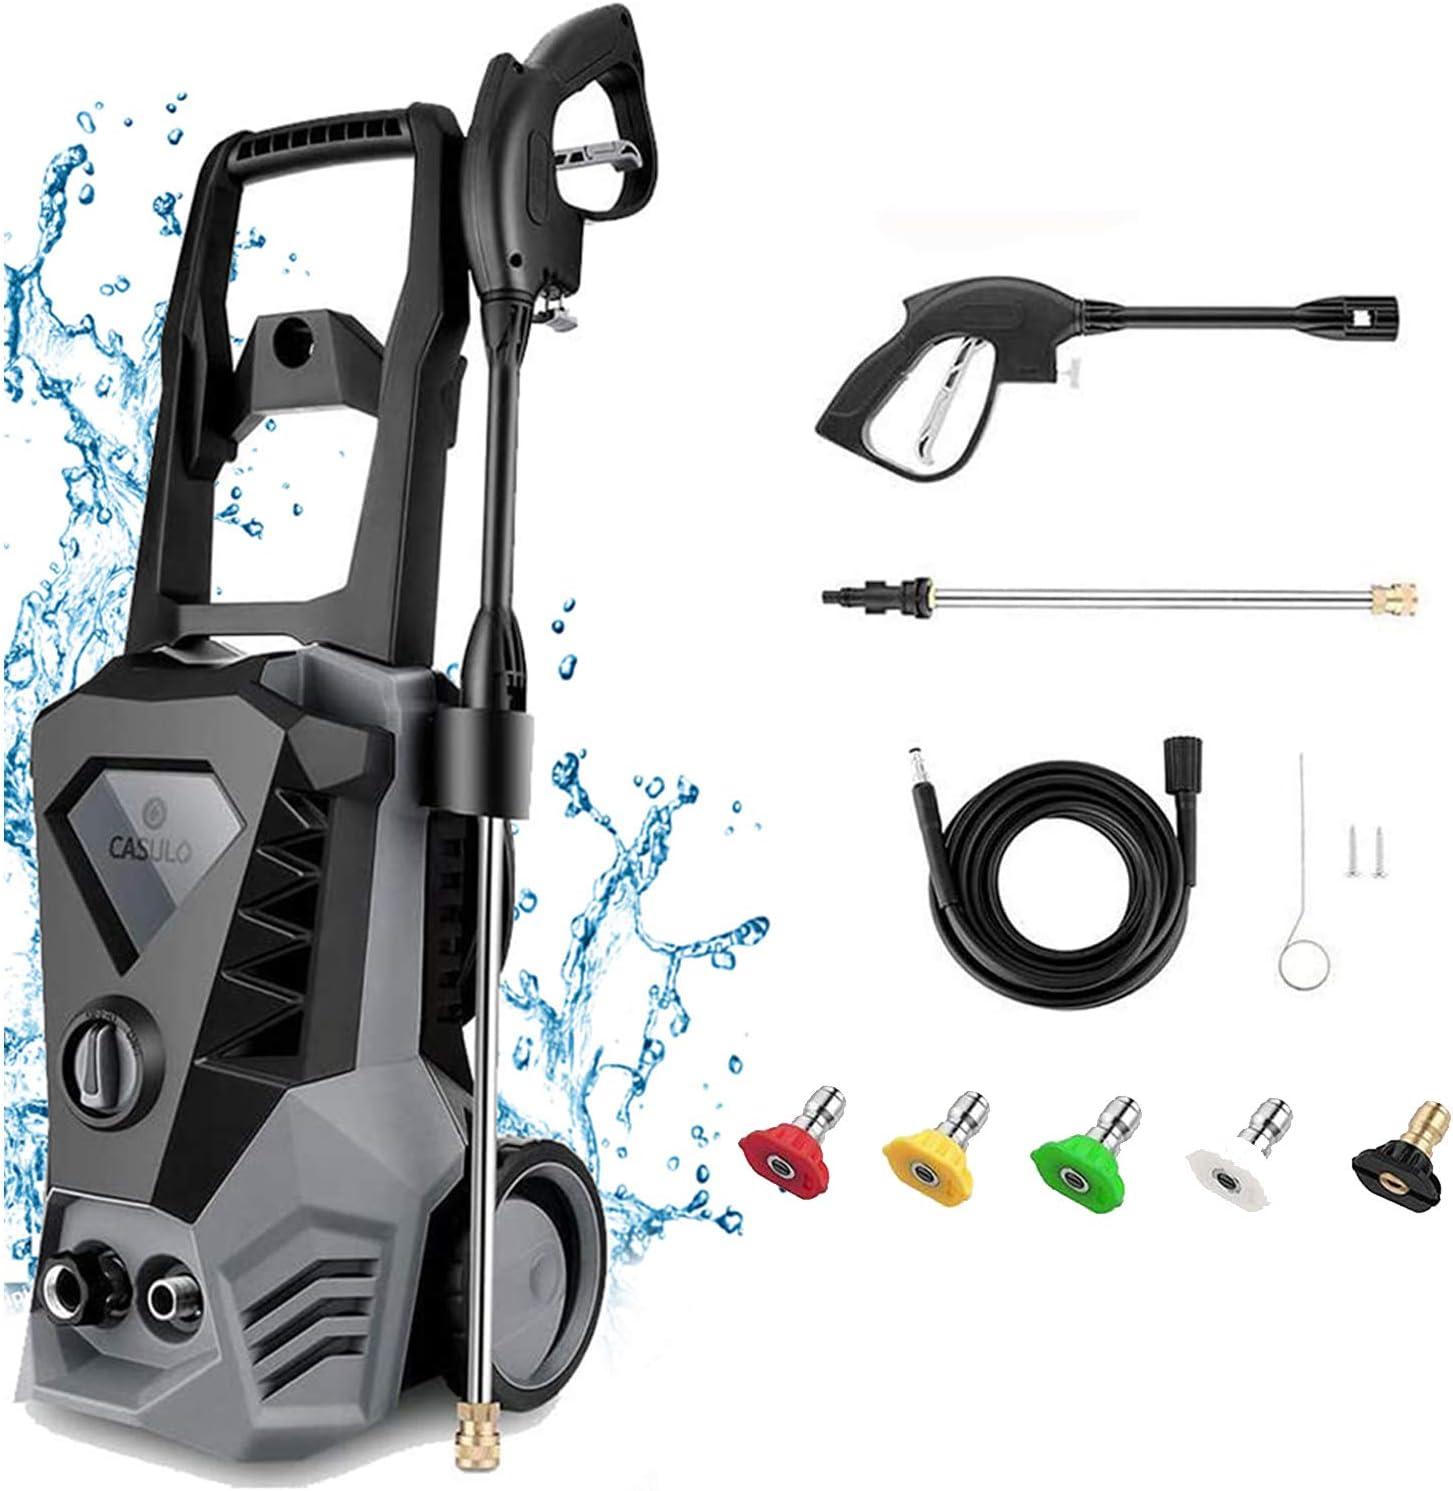 Electric Branded goods Pressure Washer 3500 PSI Sacramento Mall Max 2.6GPM Wa High 1800W Power